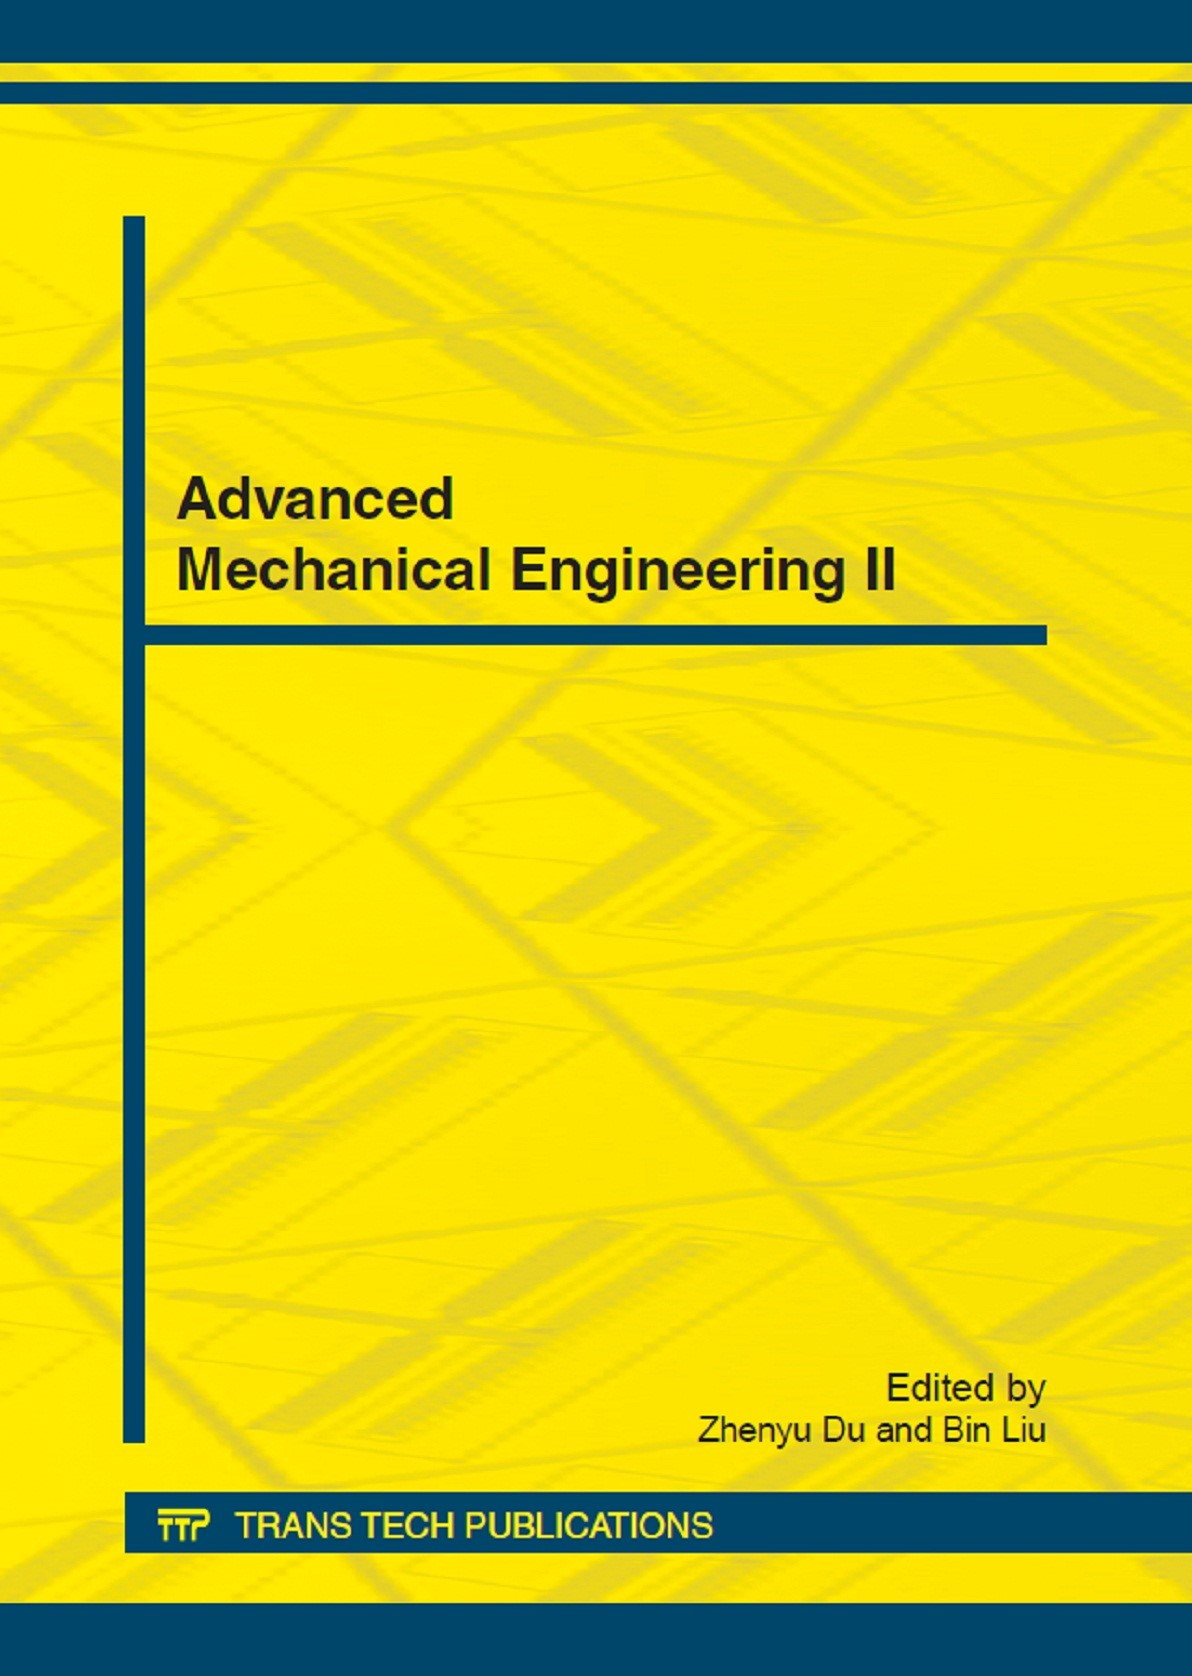 Advanced Mechanical Engineering II | Du / Liu, 2012 | Buch (Cover)